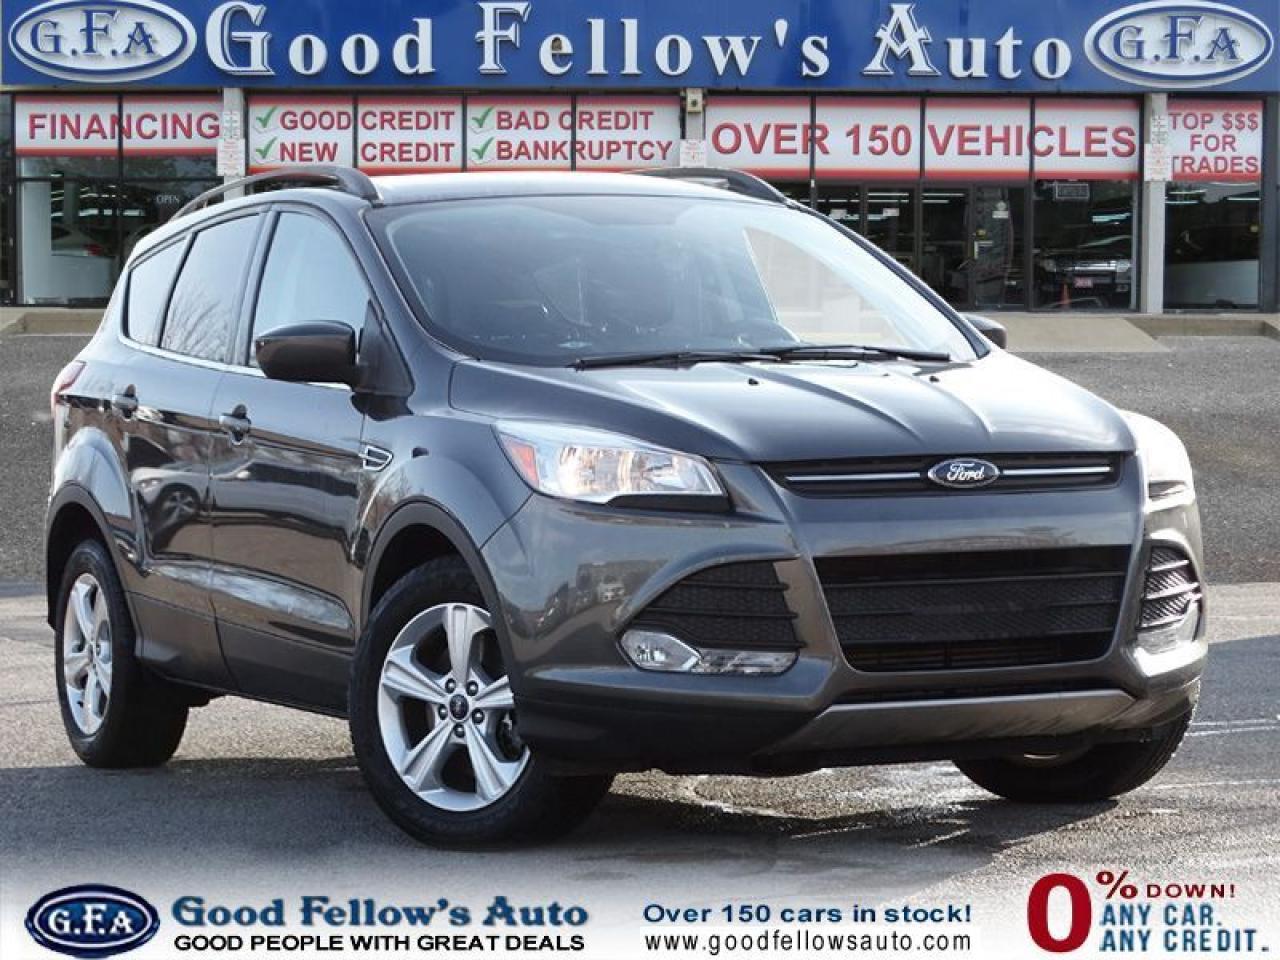 2016 Ford Escape SE MODEL, LEATHER SEATS, NAVI, REARVIEW CAMERA